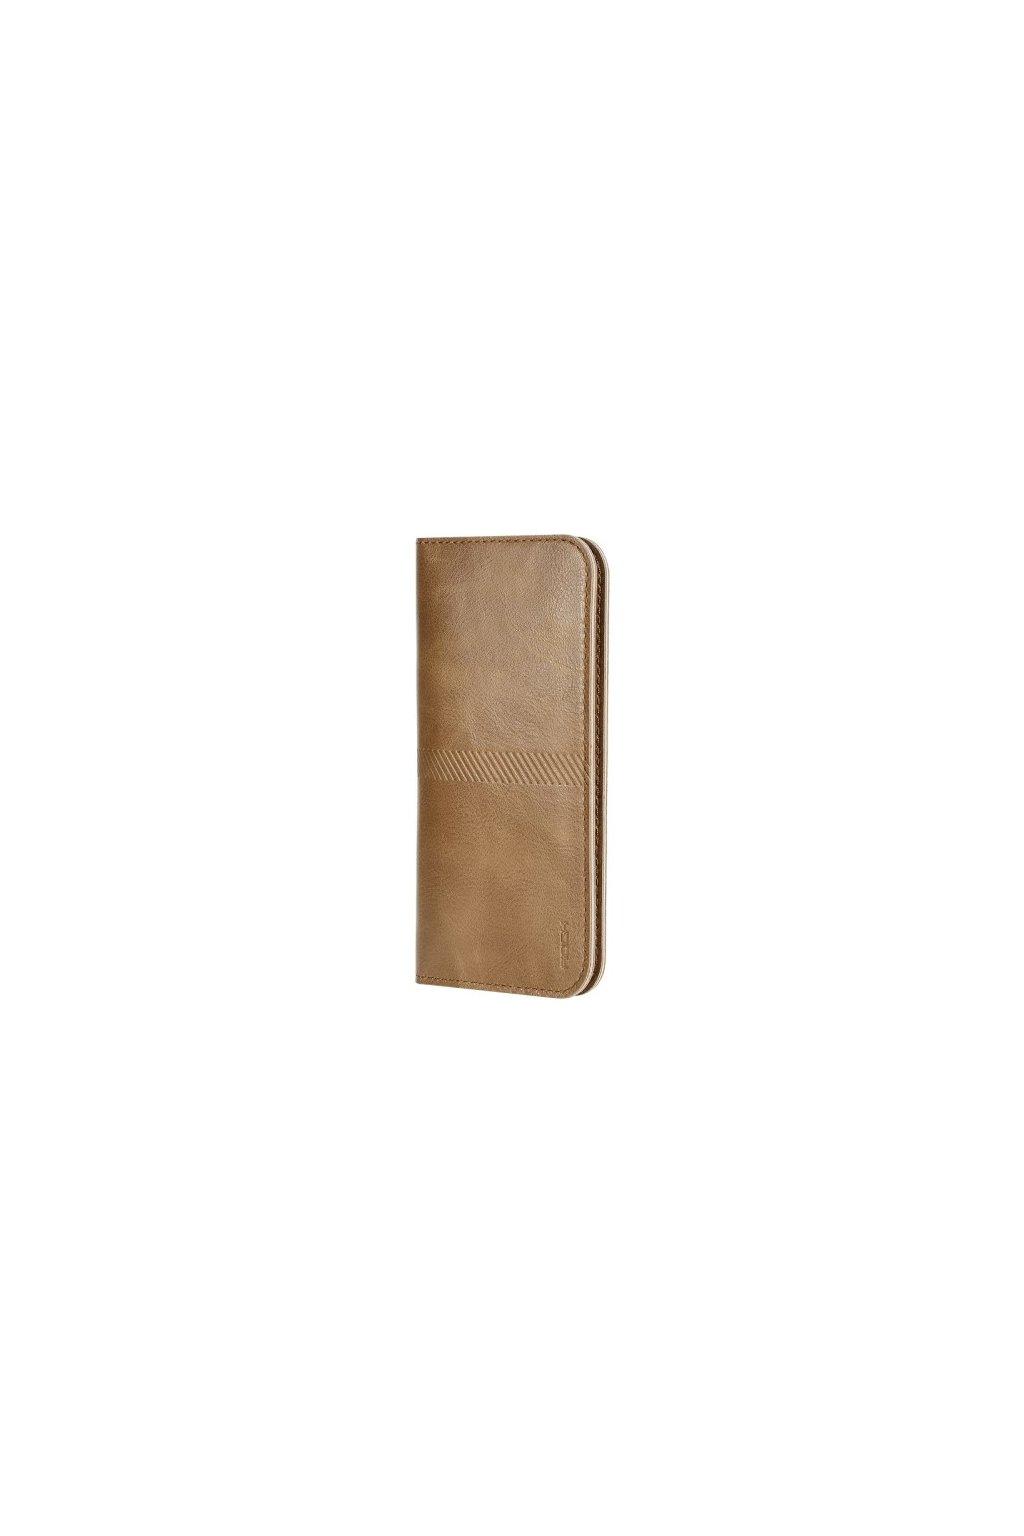 Pouzdro ROCK Slim Apple iPhone 6/6S, brown